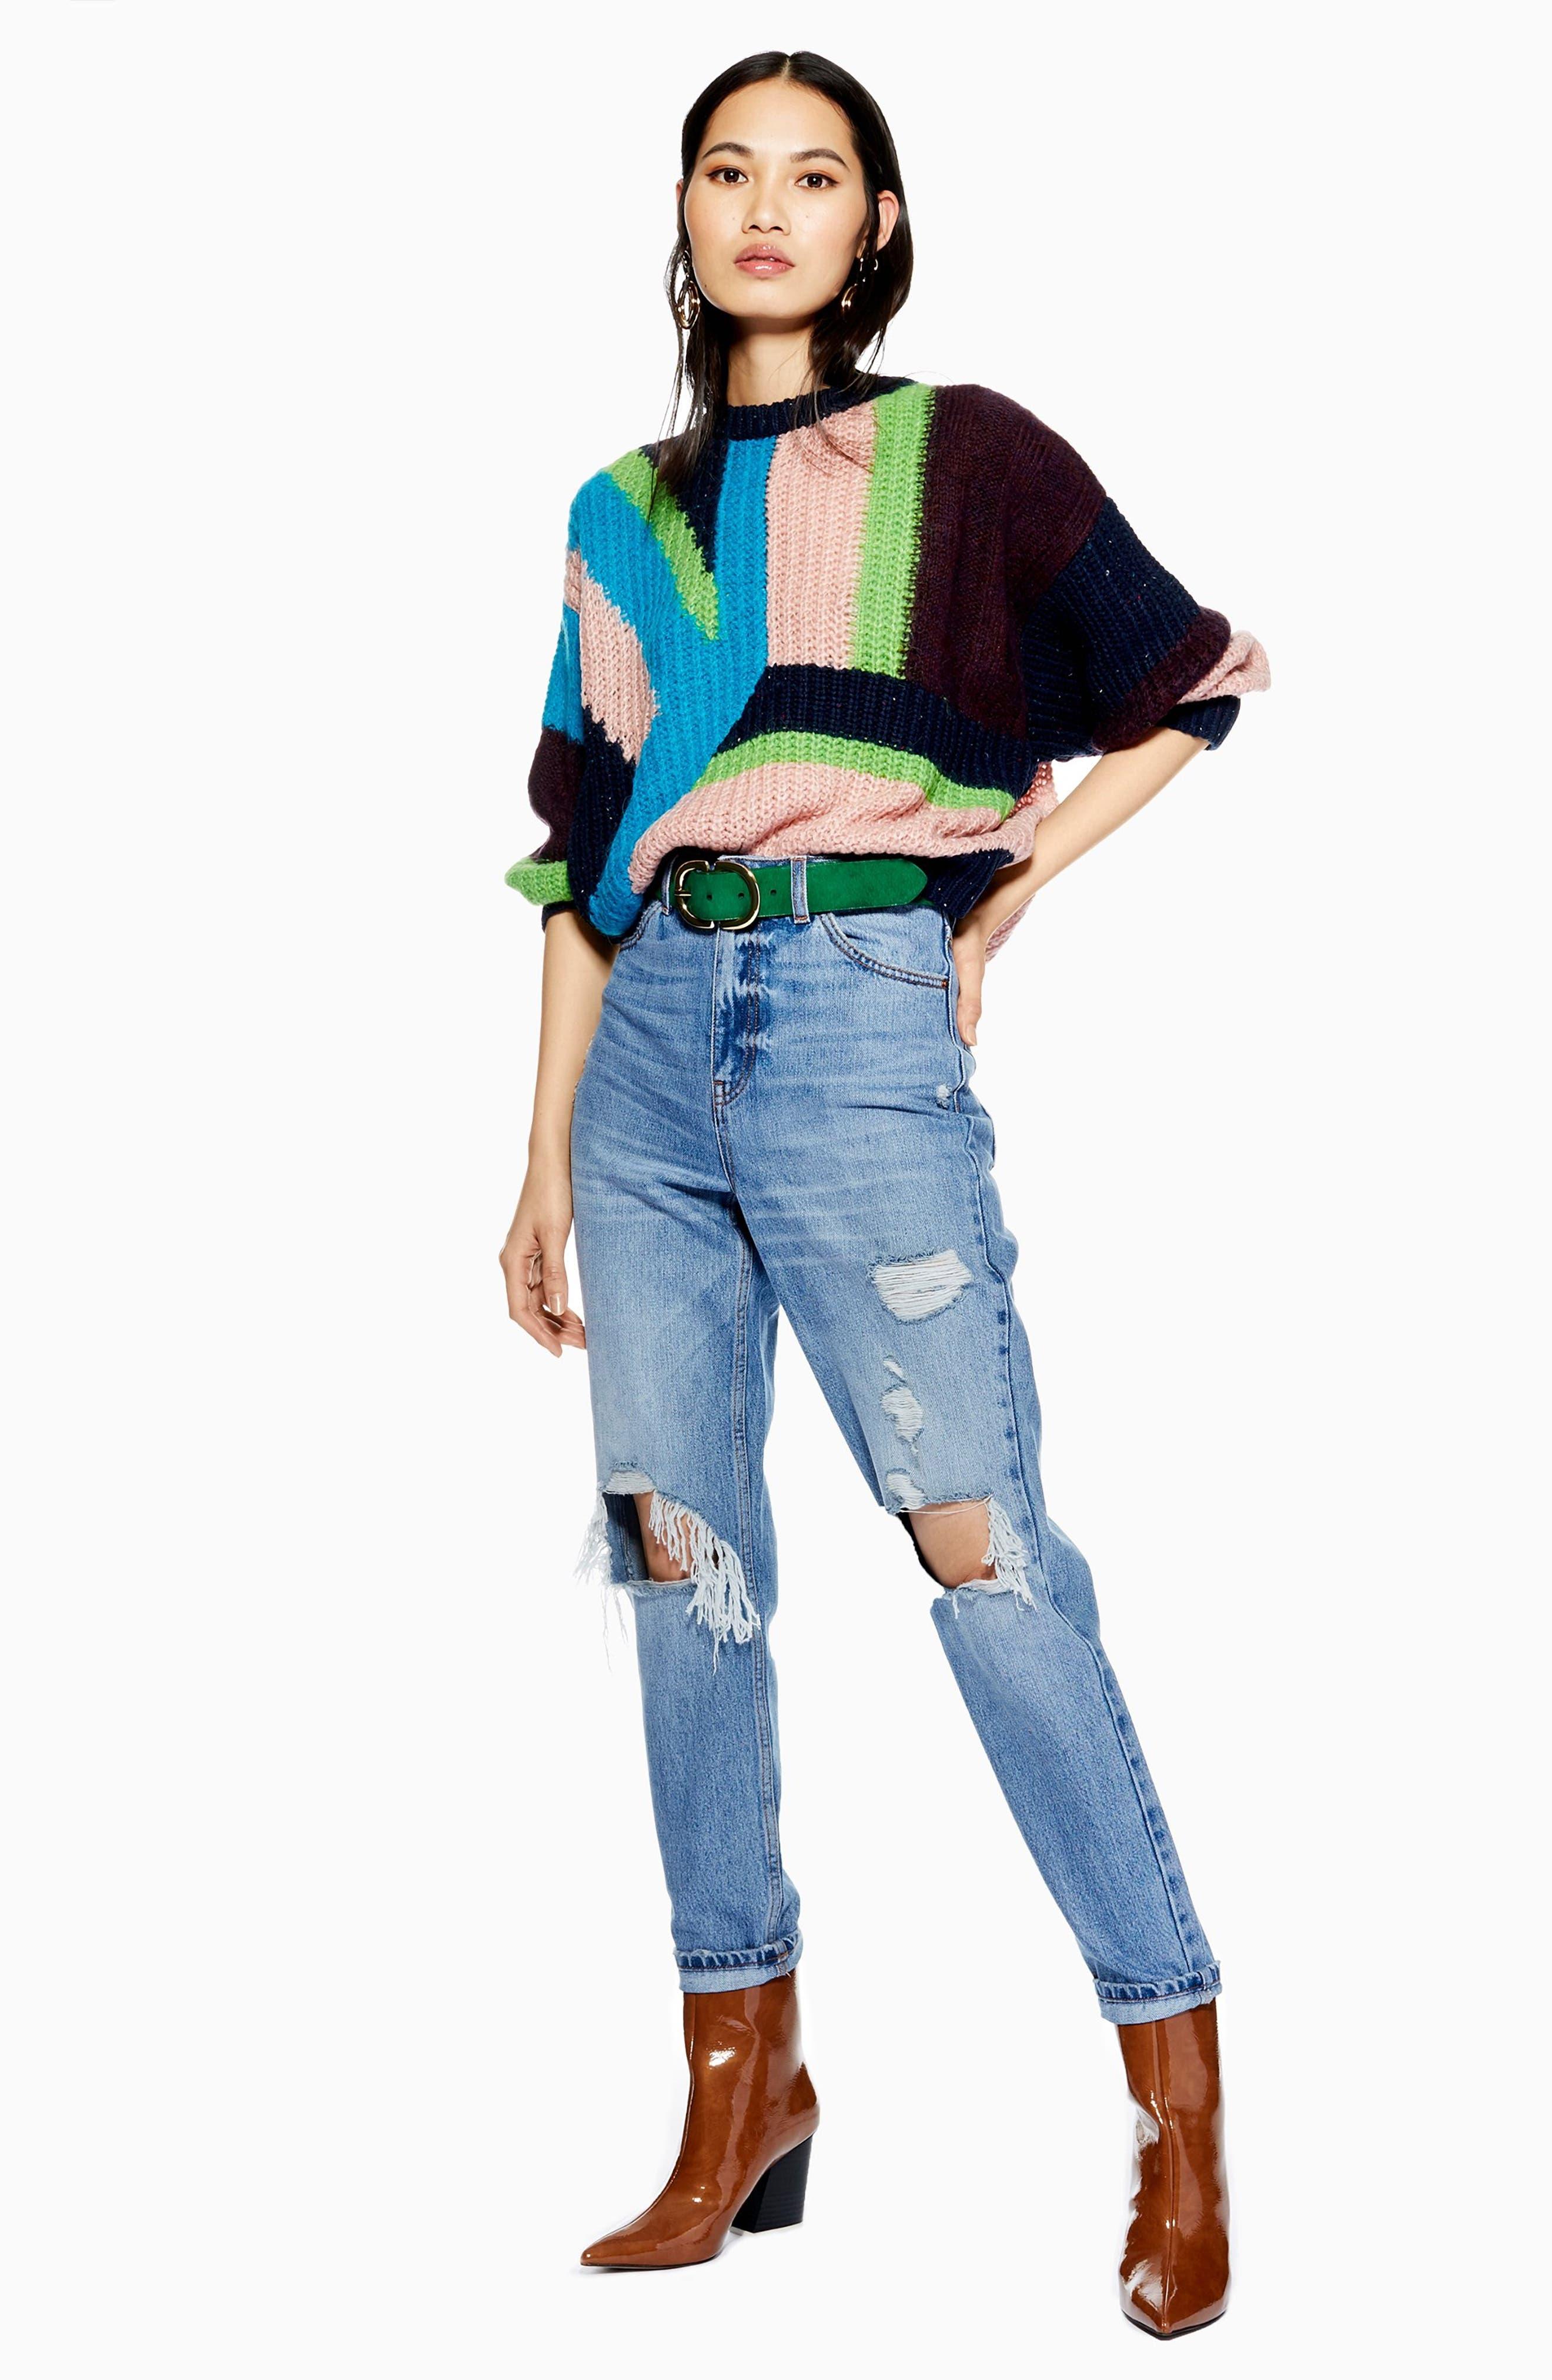 TOPSHOP,                             Colorblock Sweater,                             Alternate thumbnail 4, color,                             002